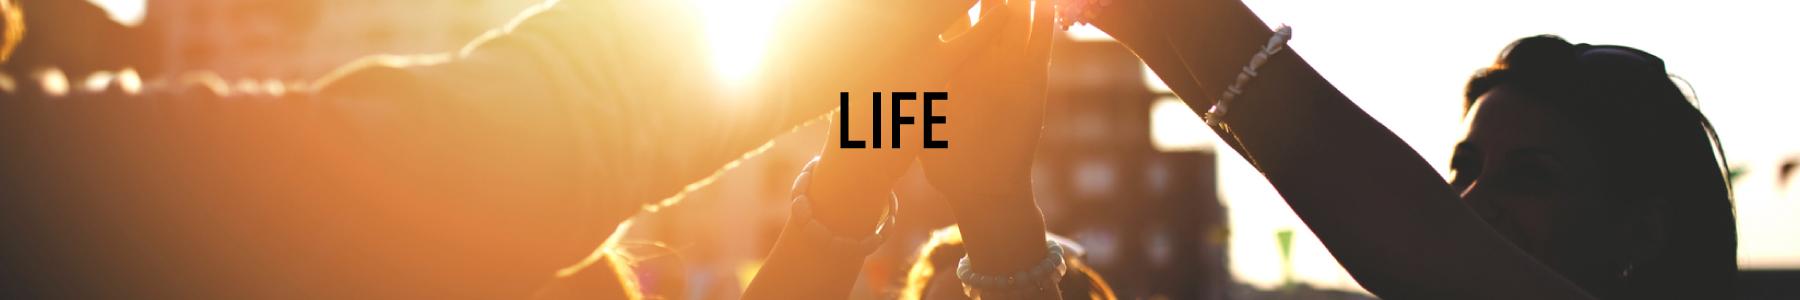 Pc life